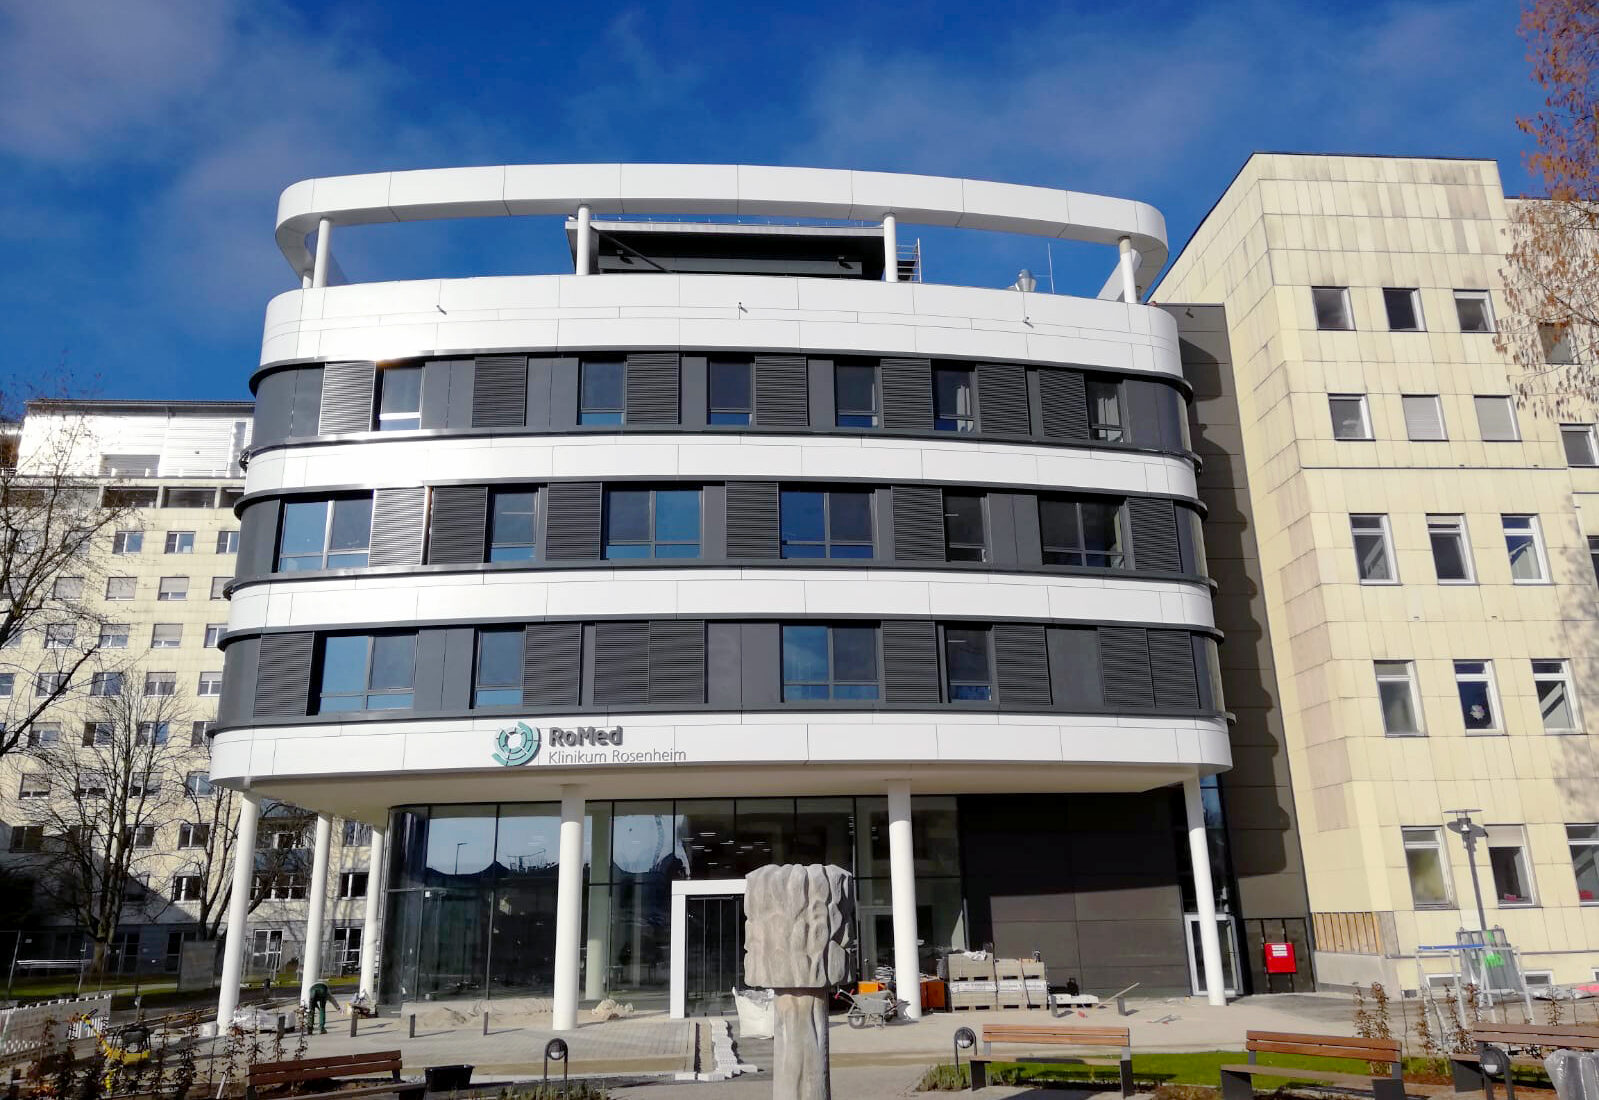 RoMed Klinik - Südseite Neubau und Altbau